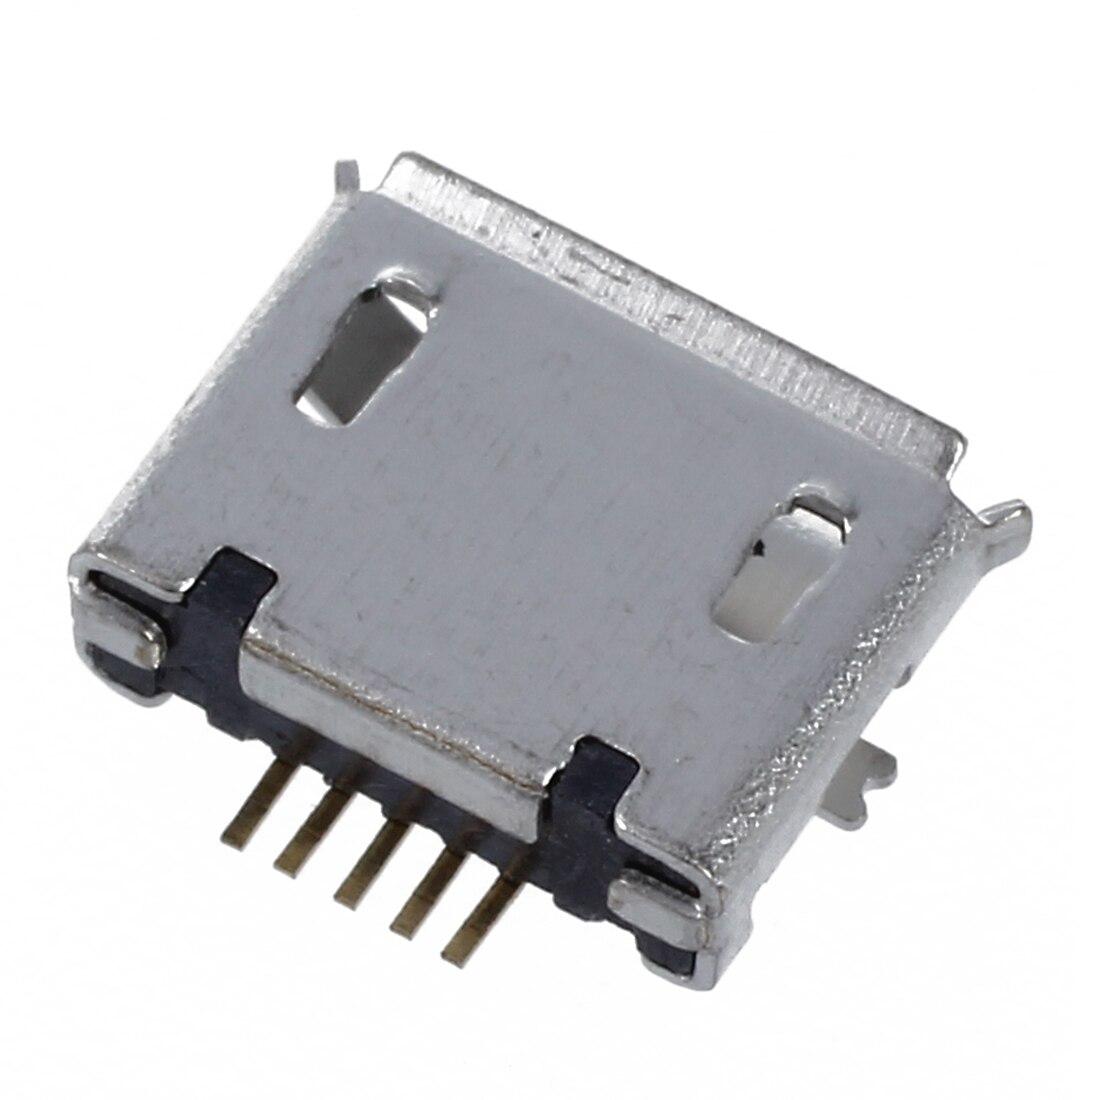 30 x cell type B Mini USB connector 5 pin jack port socket silver